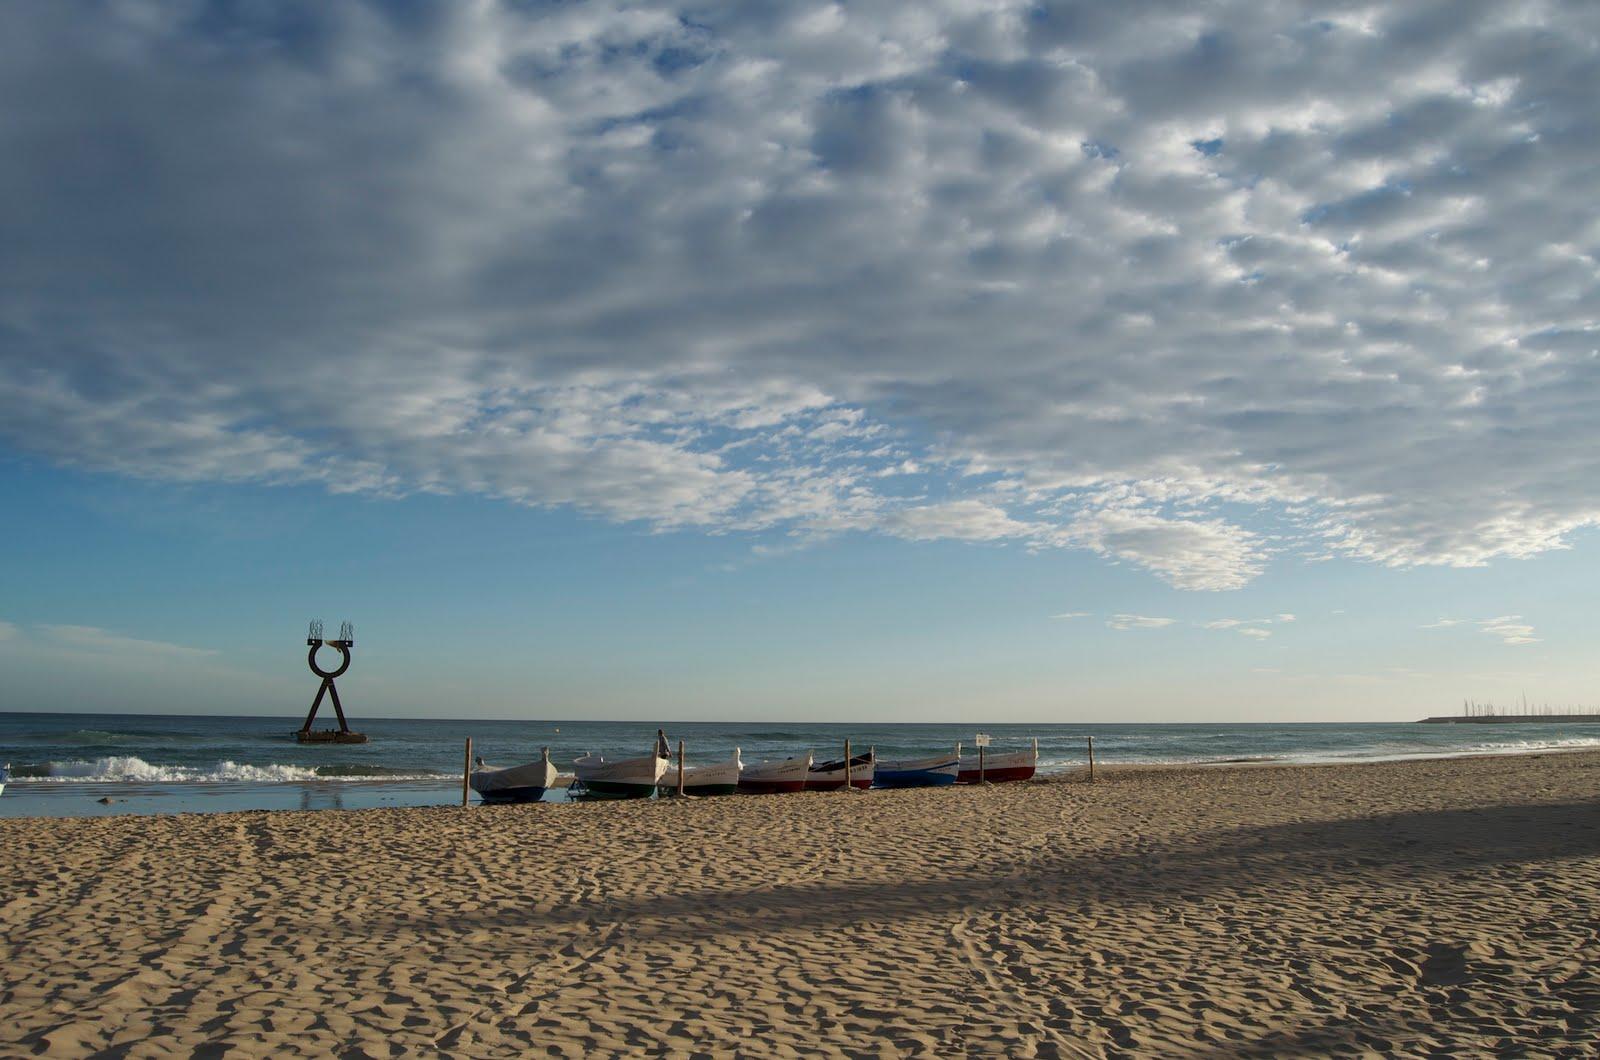 Playa cartagena chile fotos 25